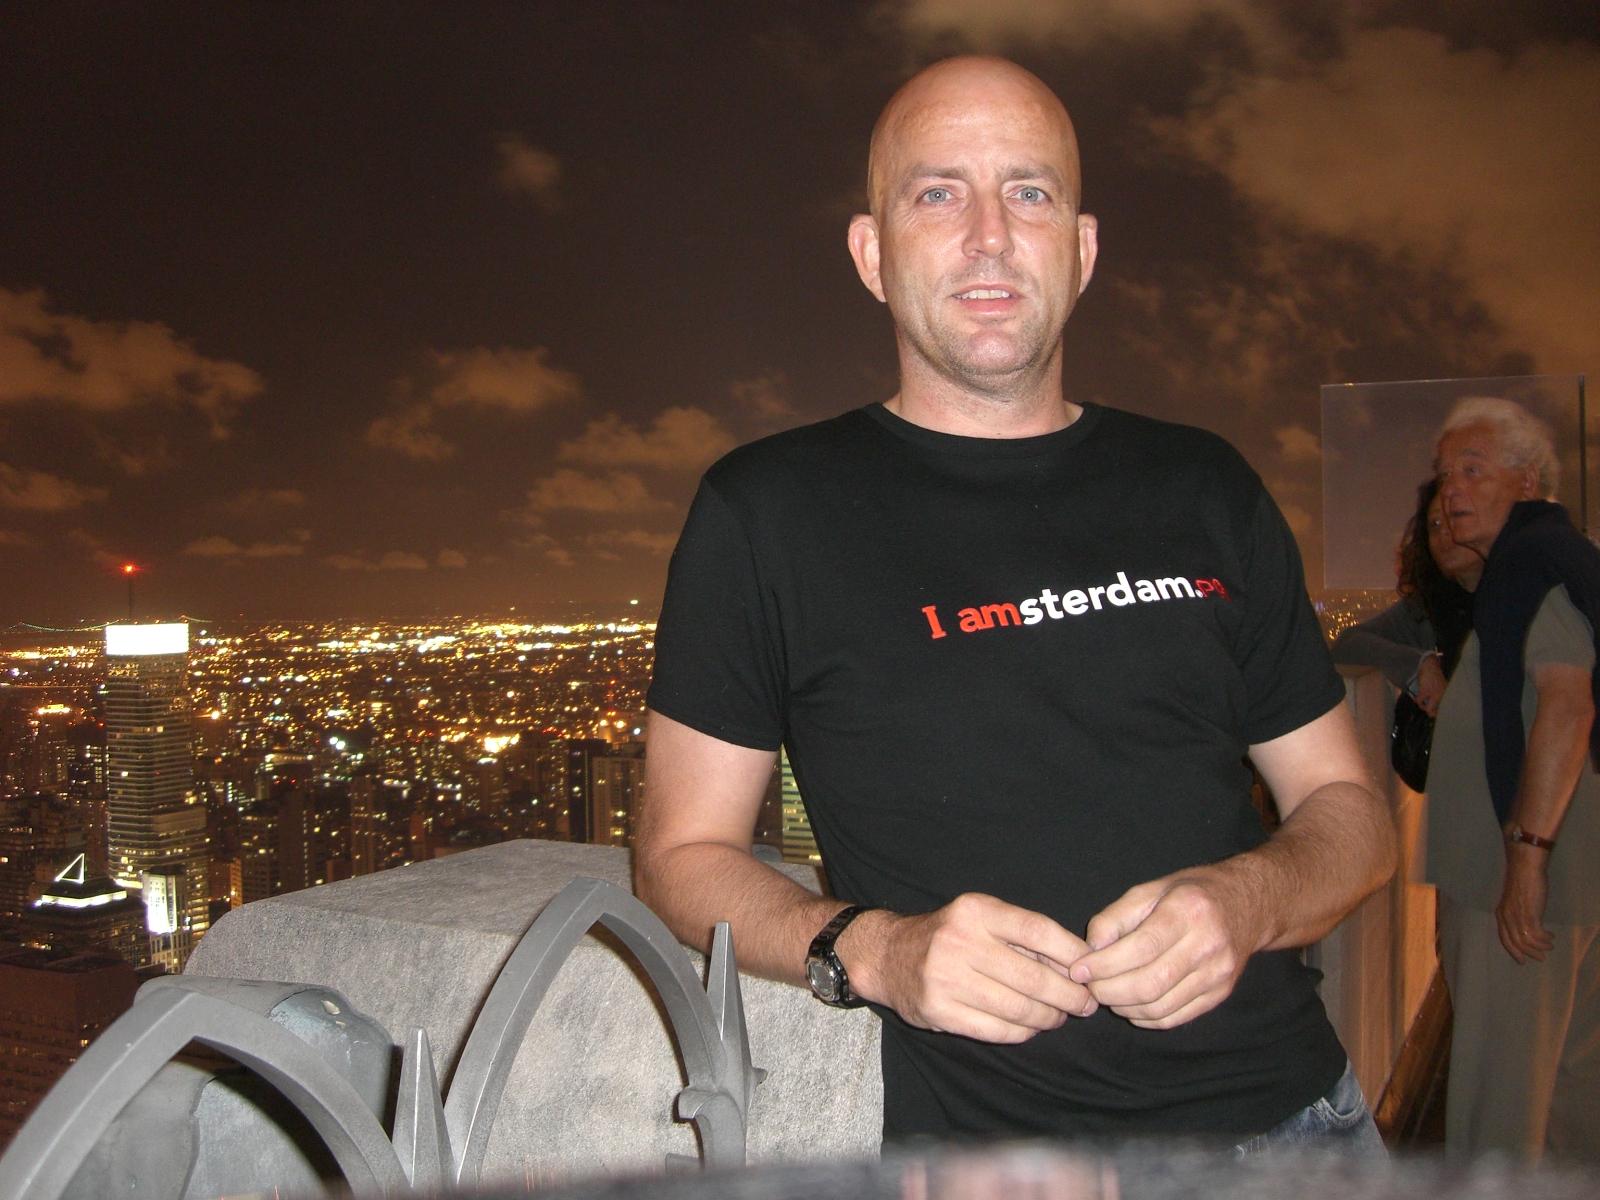 Jeroen Goeman Borgesius